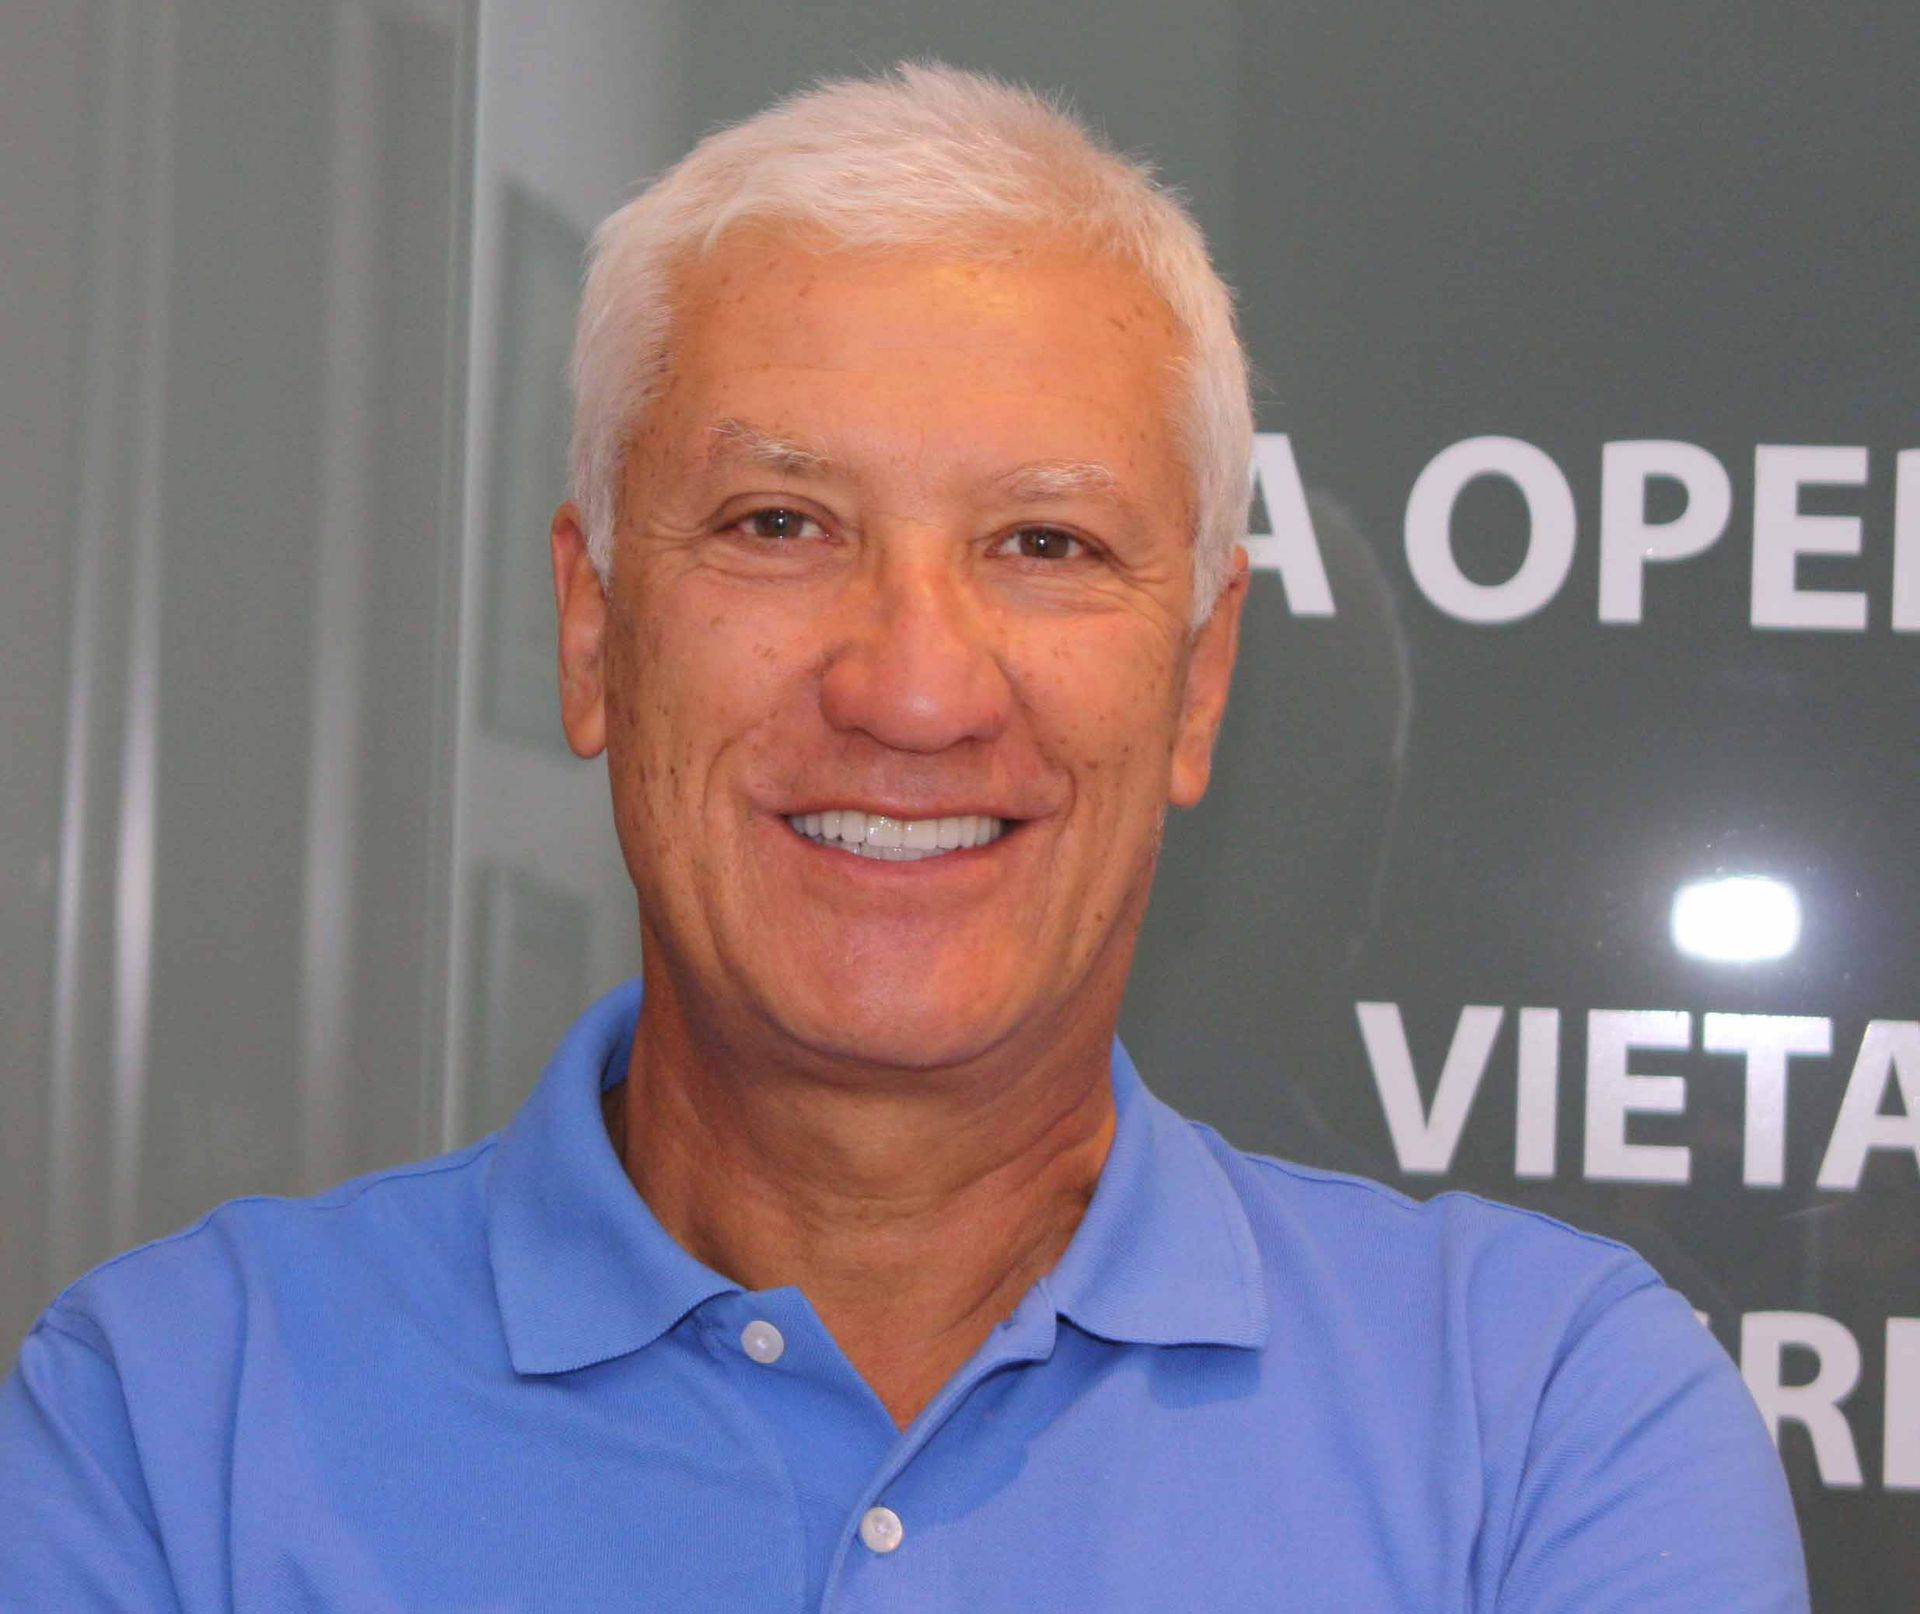 Dr. Walter Renda